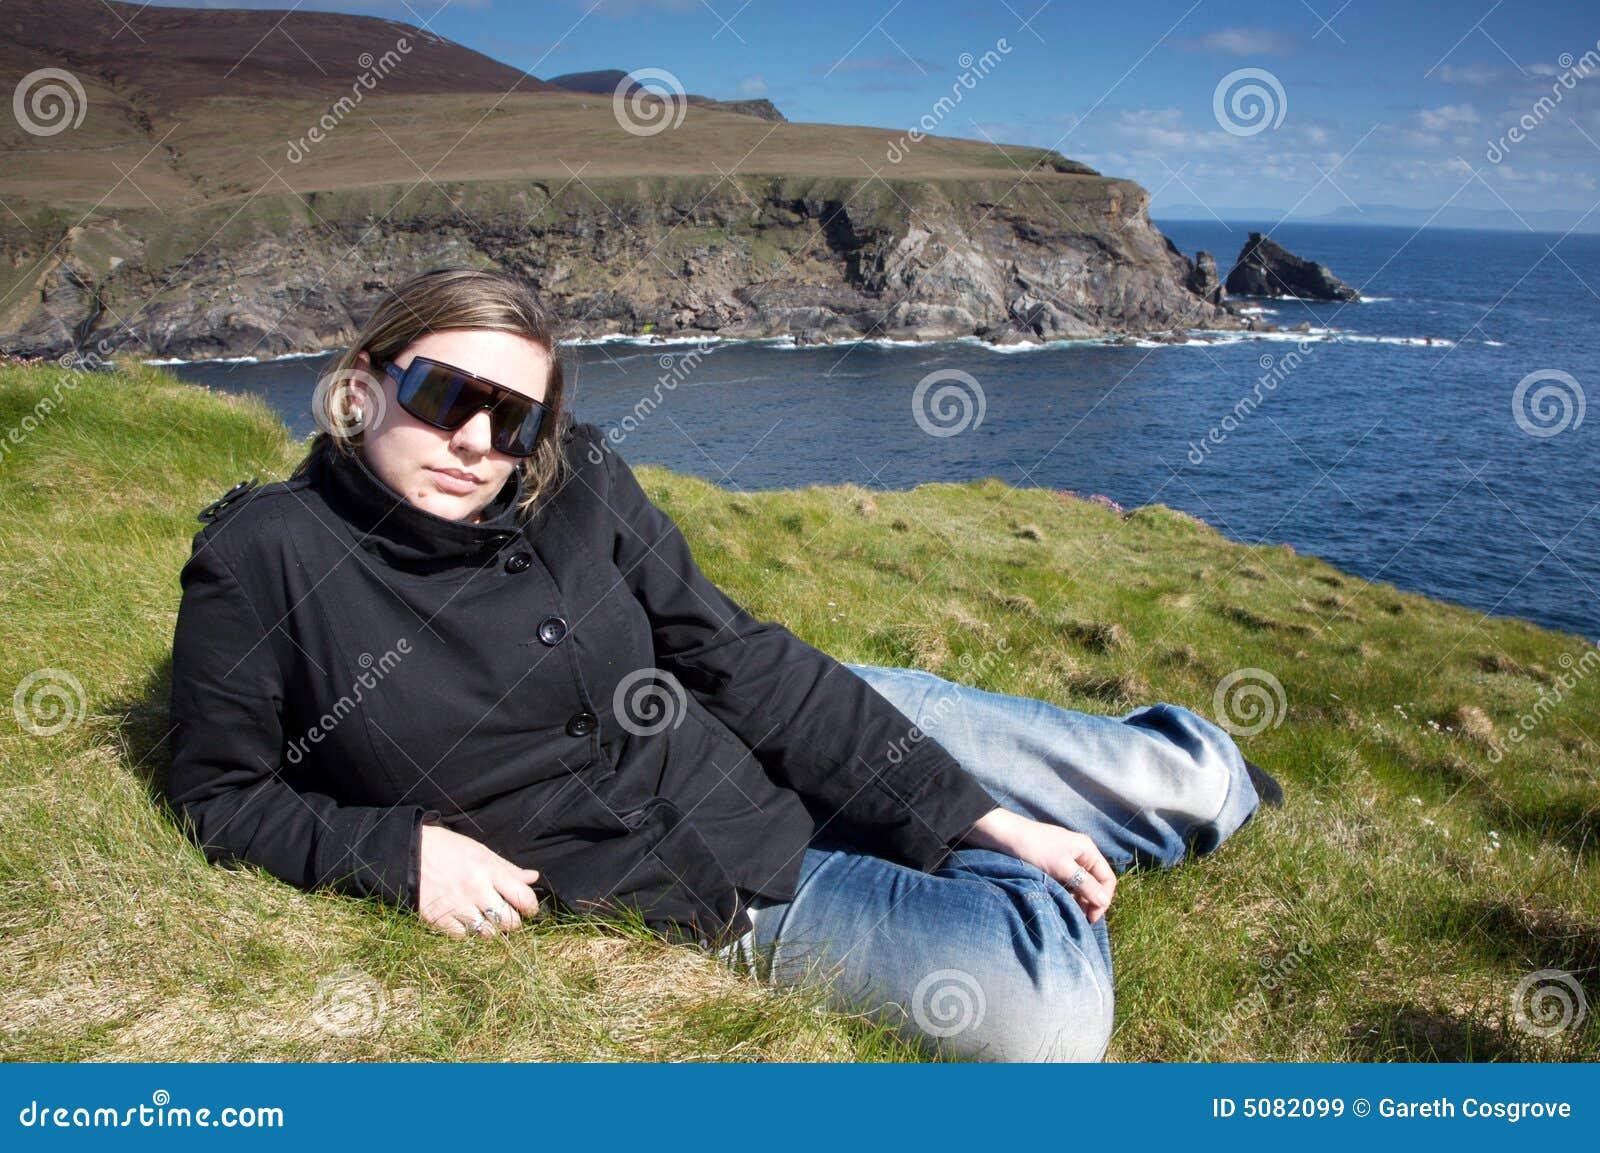 Woman near cliffs in Ireland